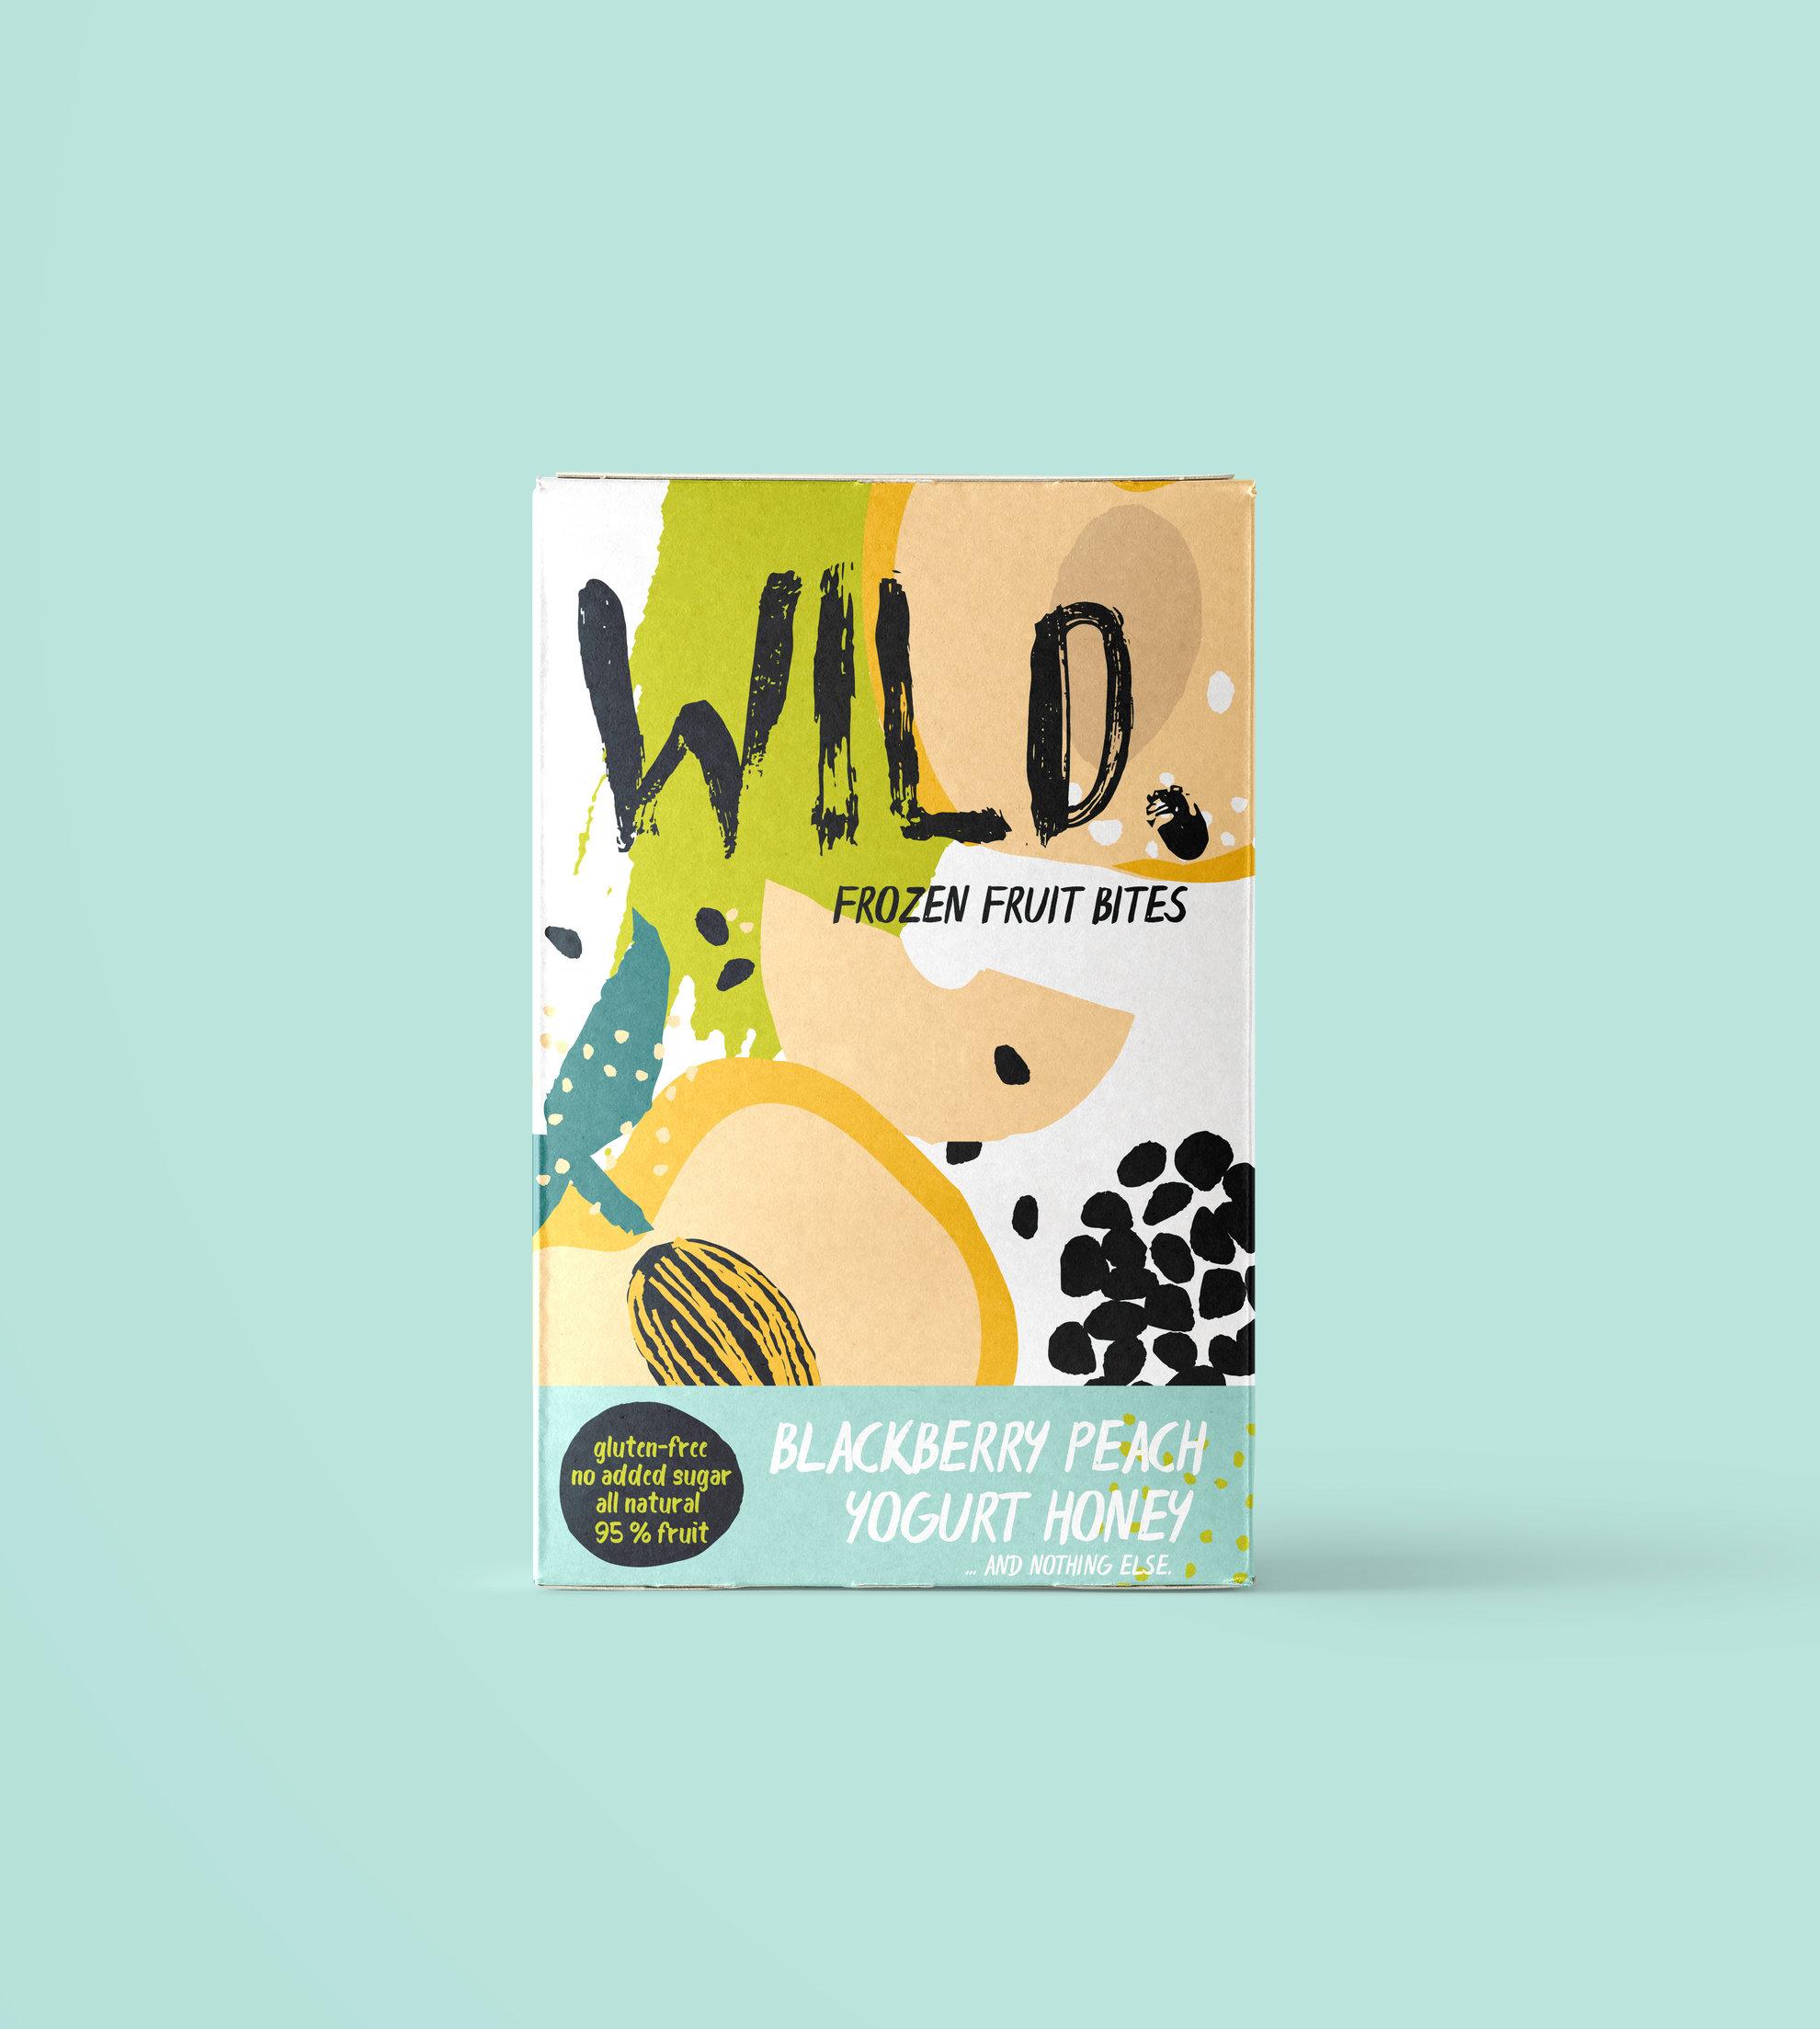 Wild - Branding project